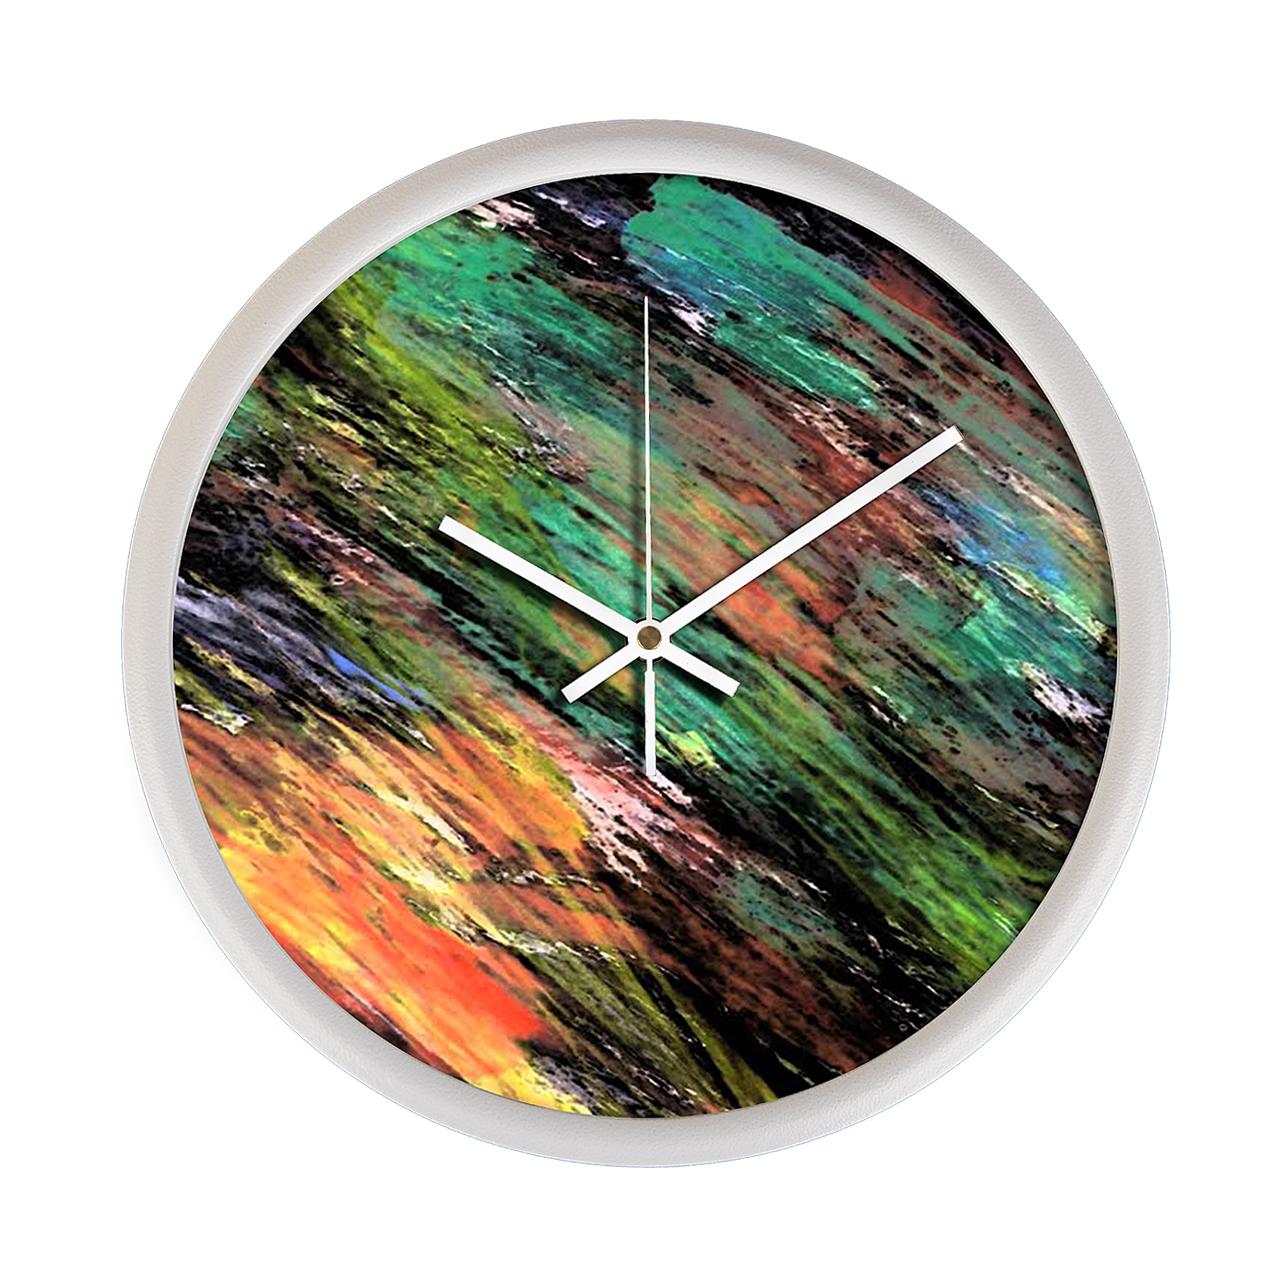 ساعت دیواری مینی مال لاکچری مدل 35Dio3_0143